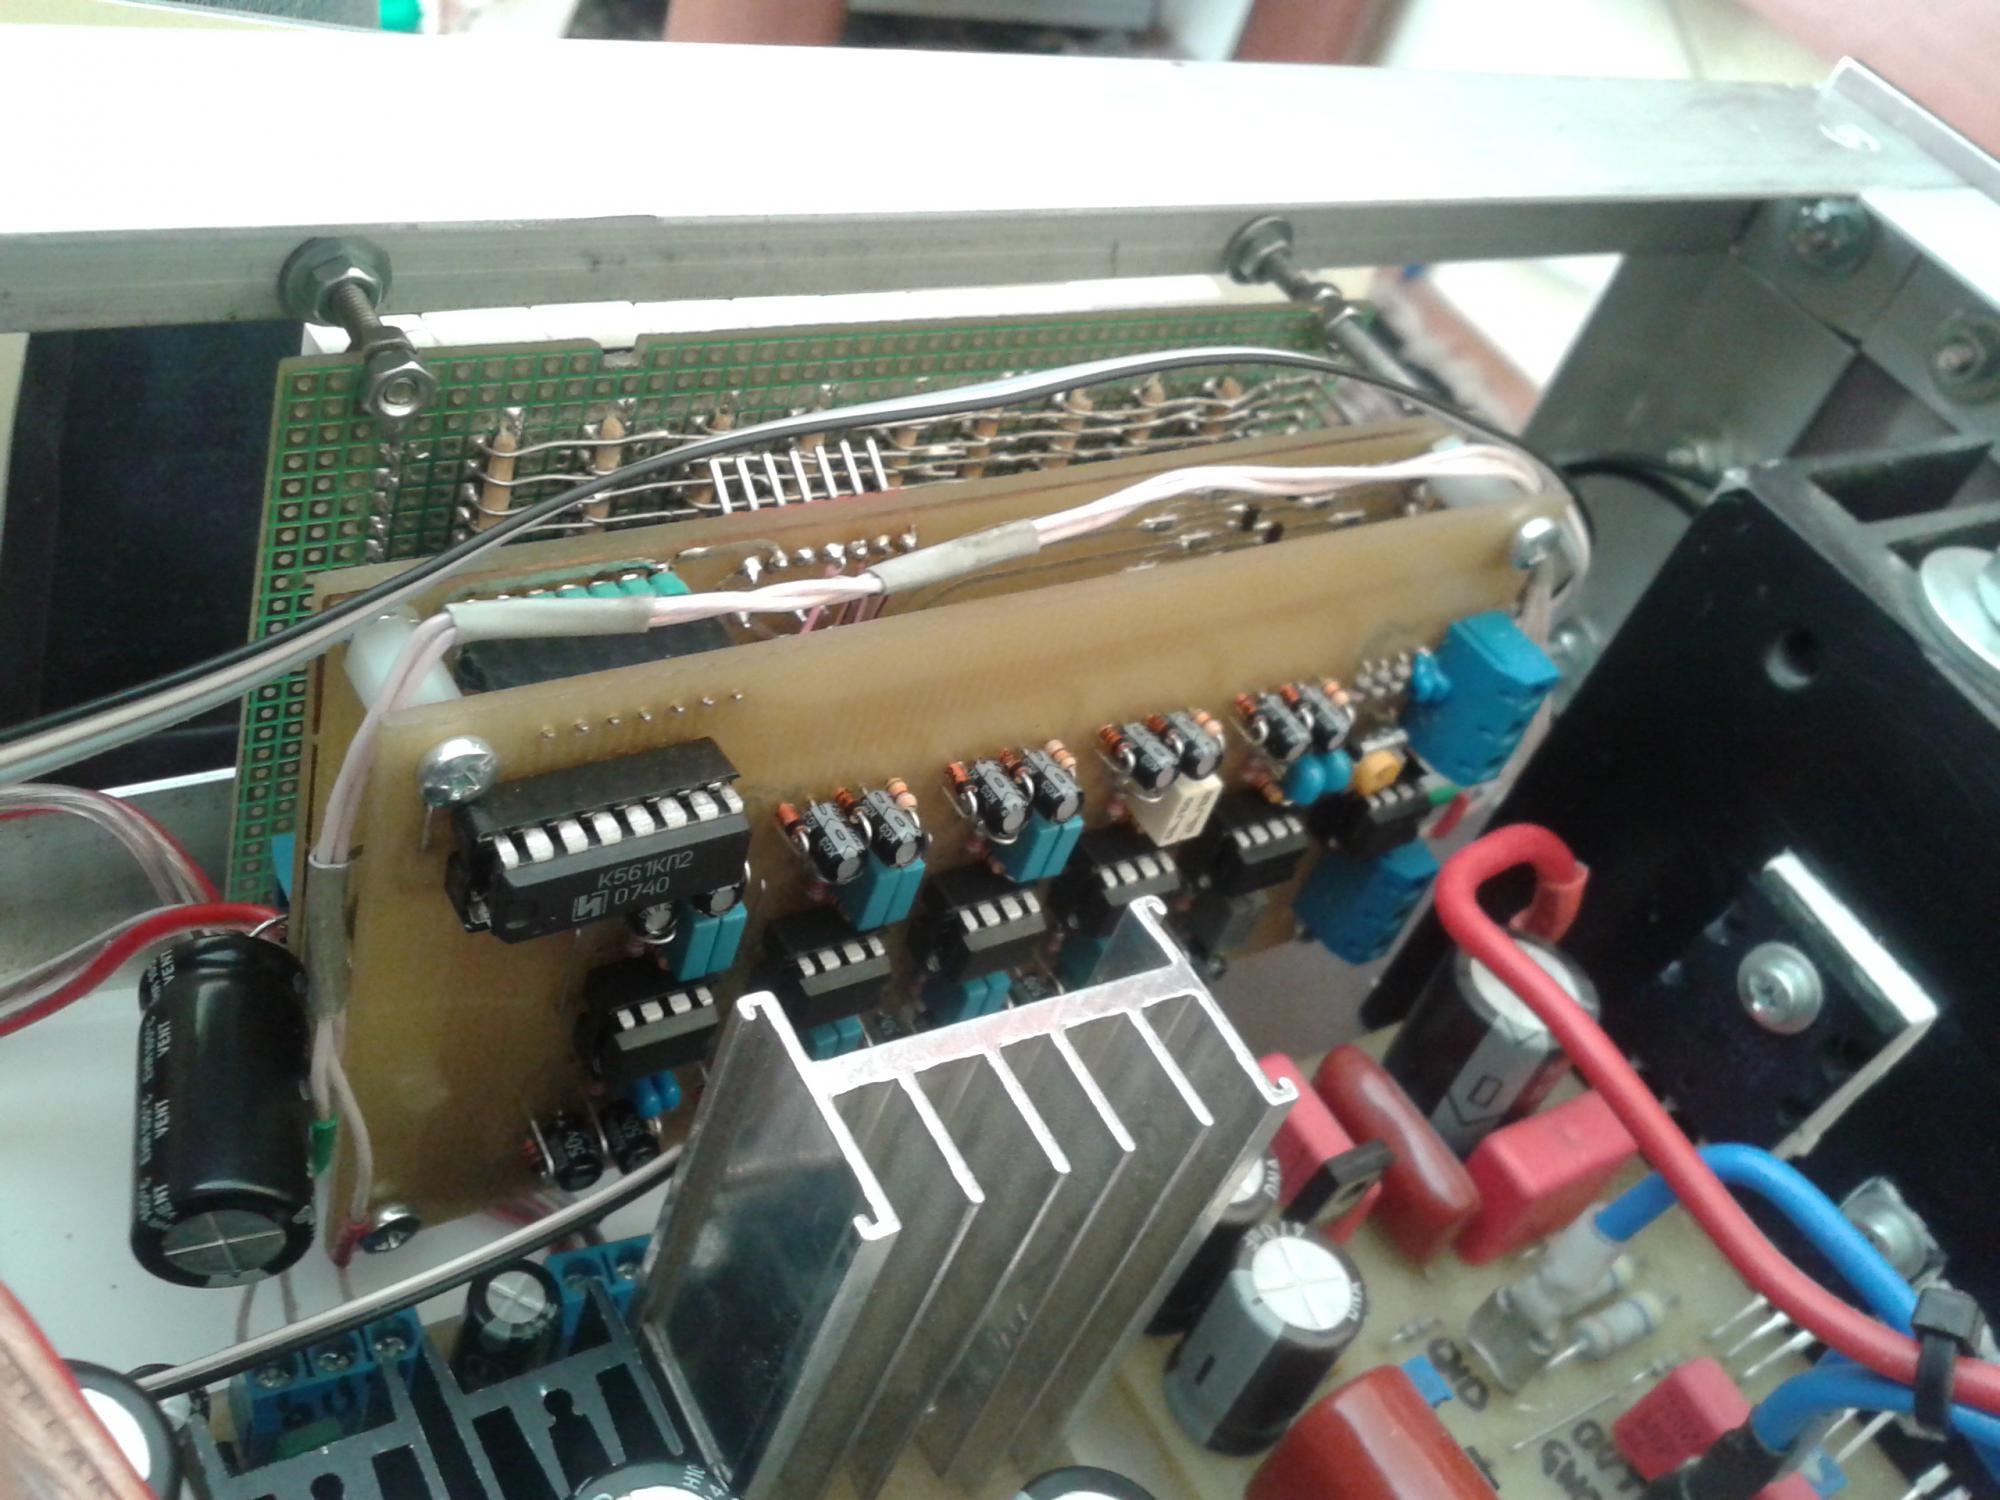 спектроанализатор на 7 столбцов схема